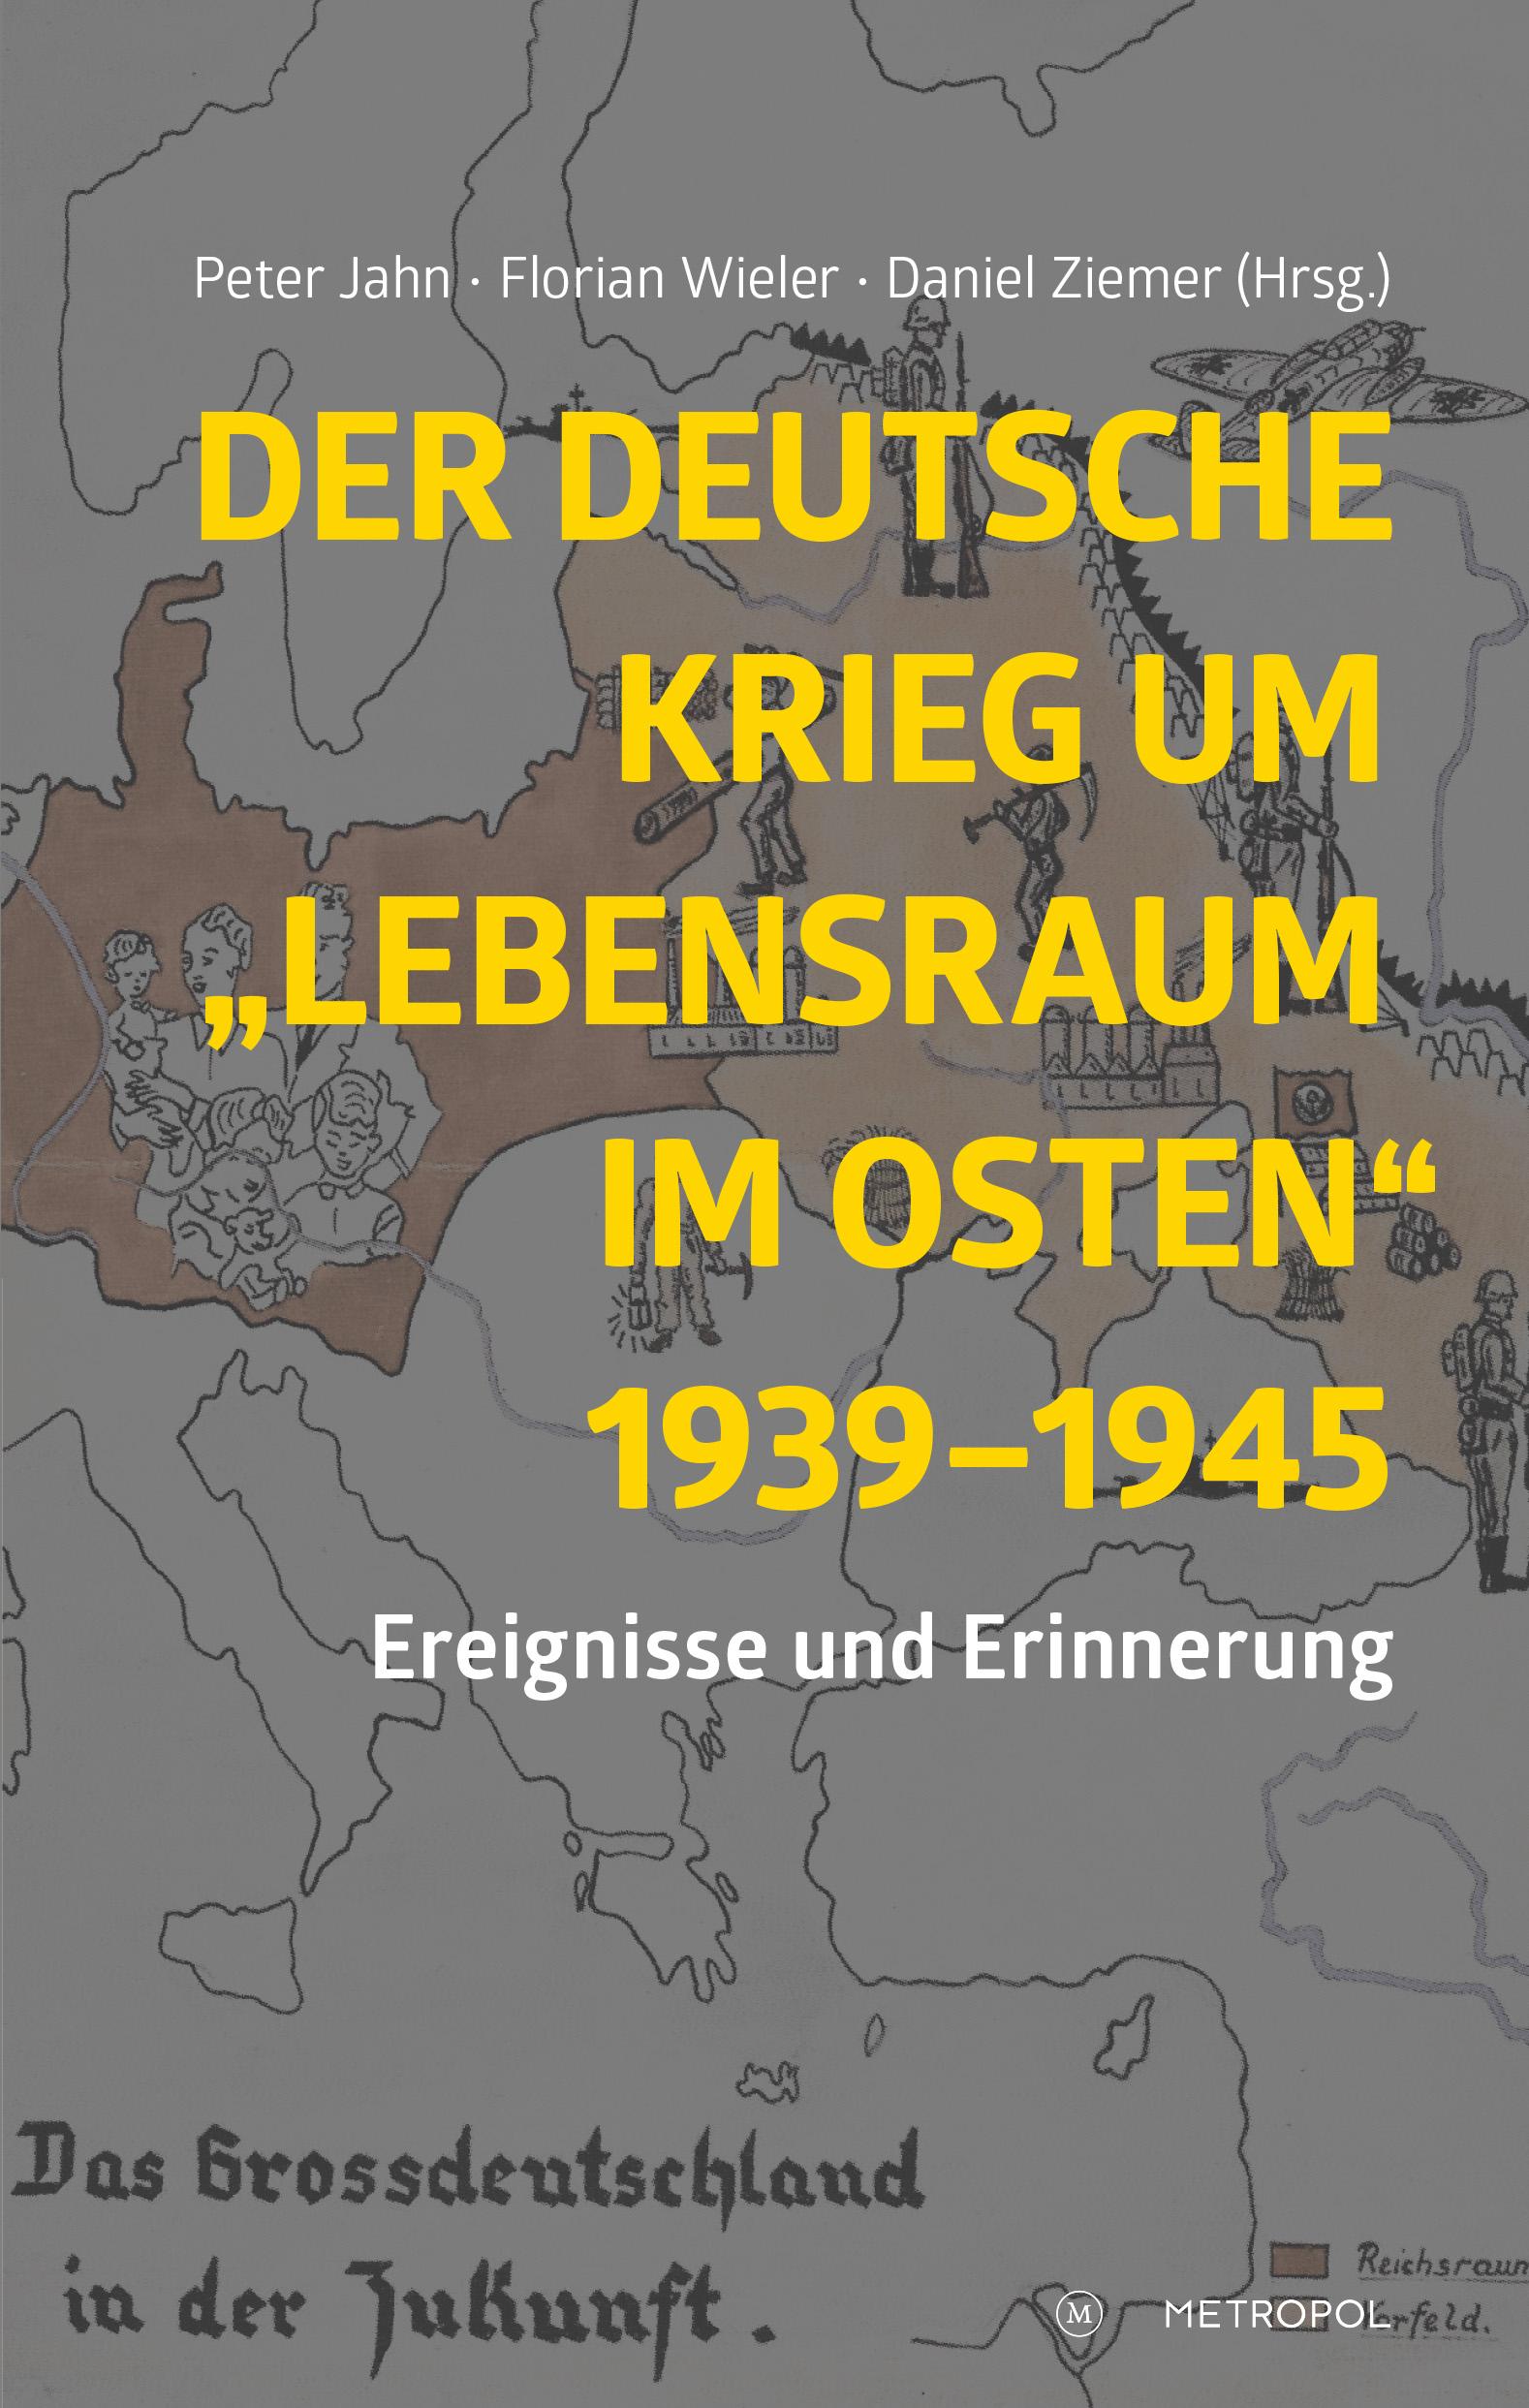 us_jahn_lebensraum_fahne_15mm.indd